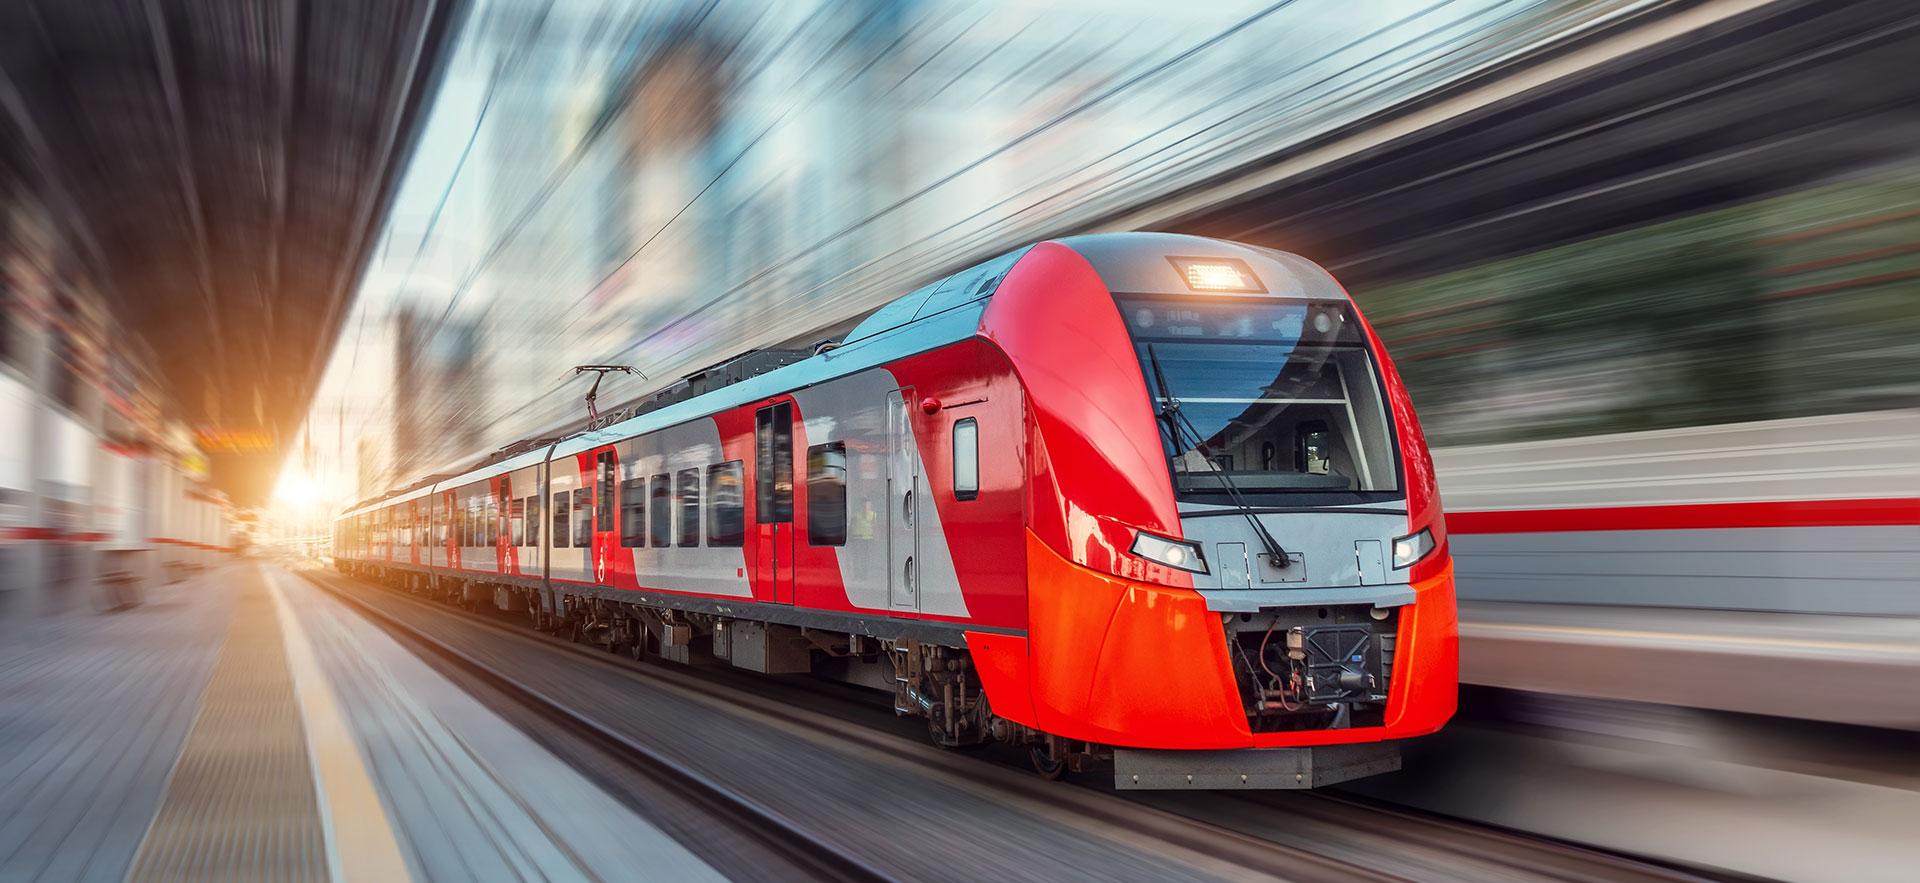 pic_header_railways_new